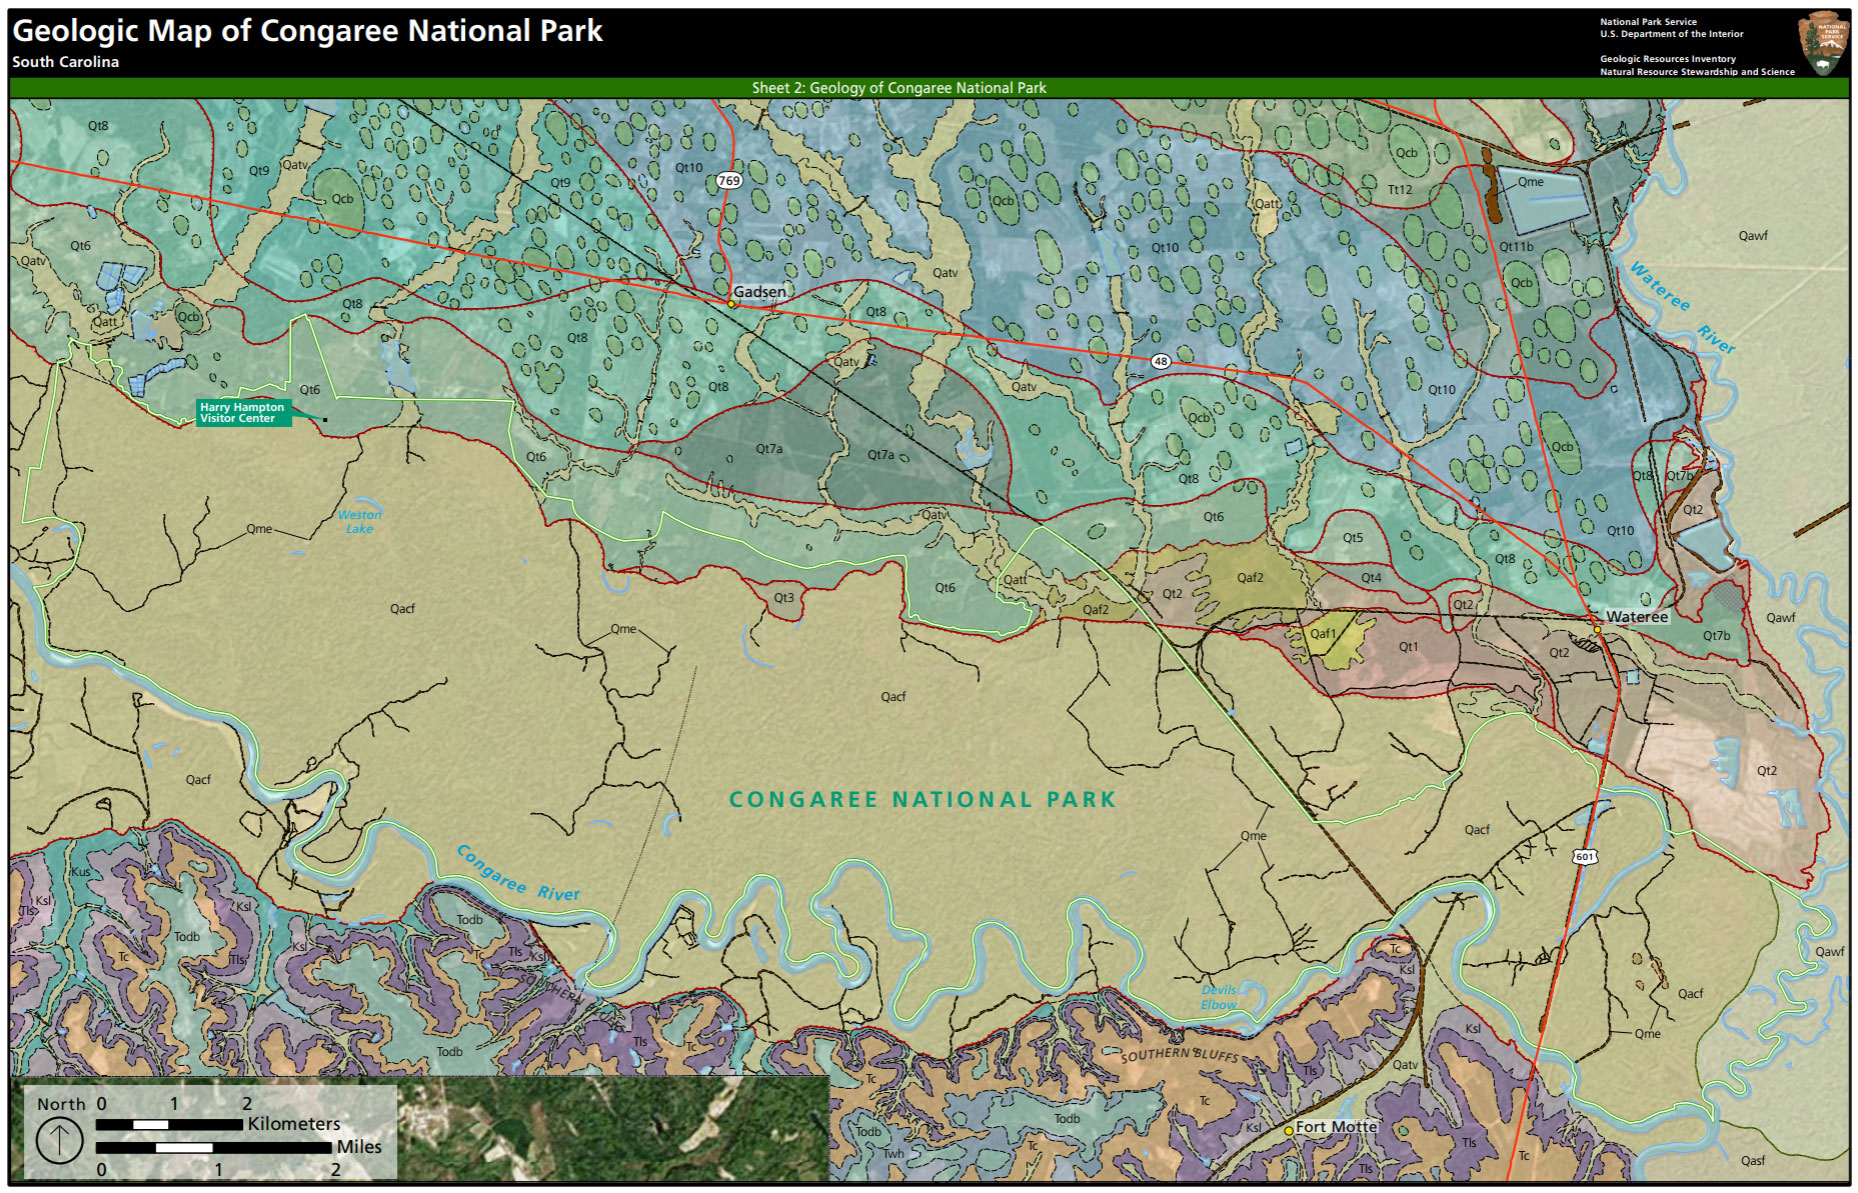 NPS Geodiversity AtlasCongaree National Park South Carolina US